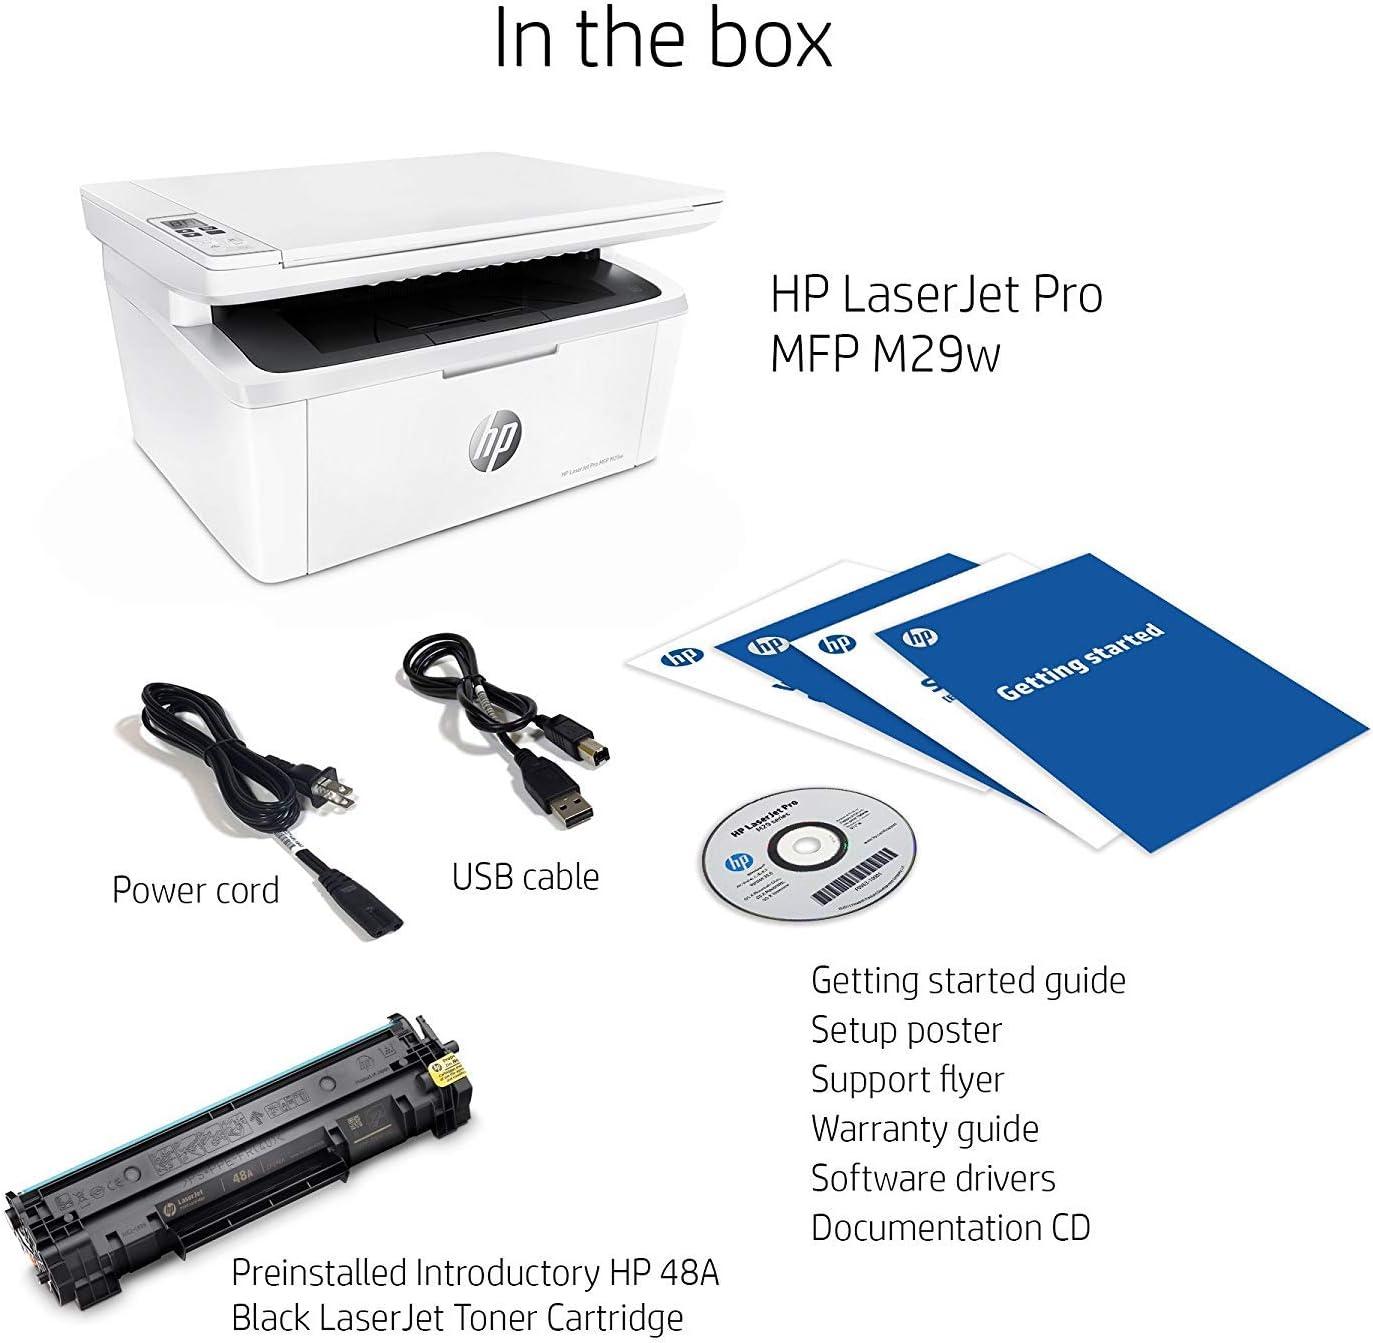 HP LaserJet Pro M29w Wireless All-in-One Laser Printer, Works with Alexa (Y5S53A)